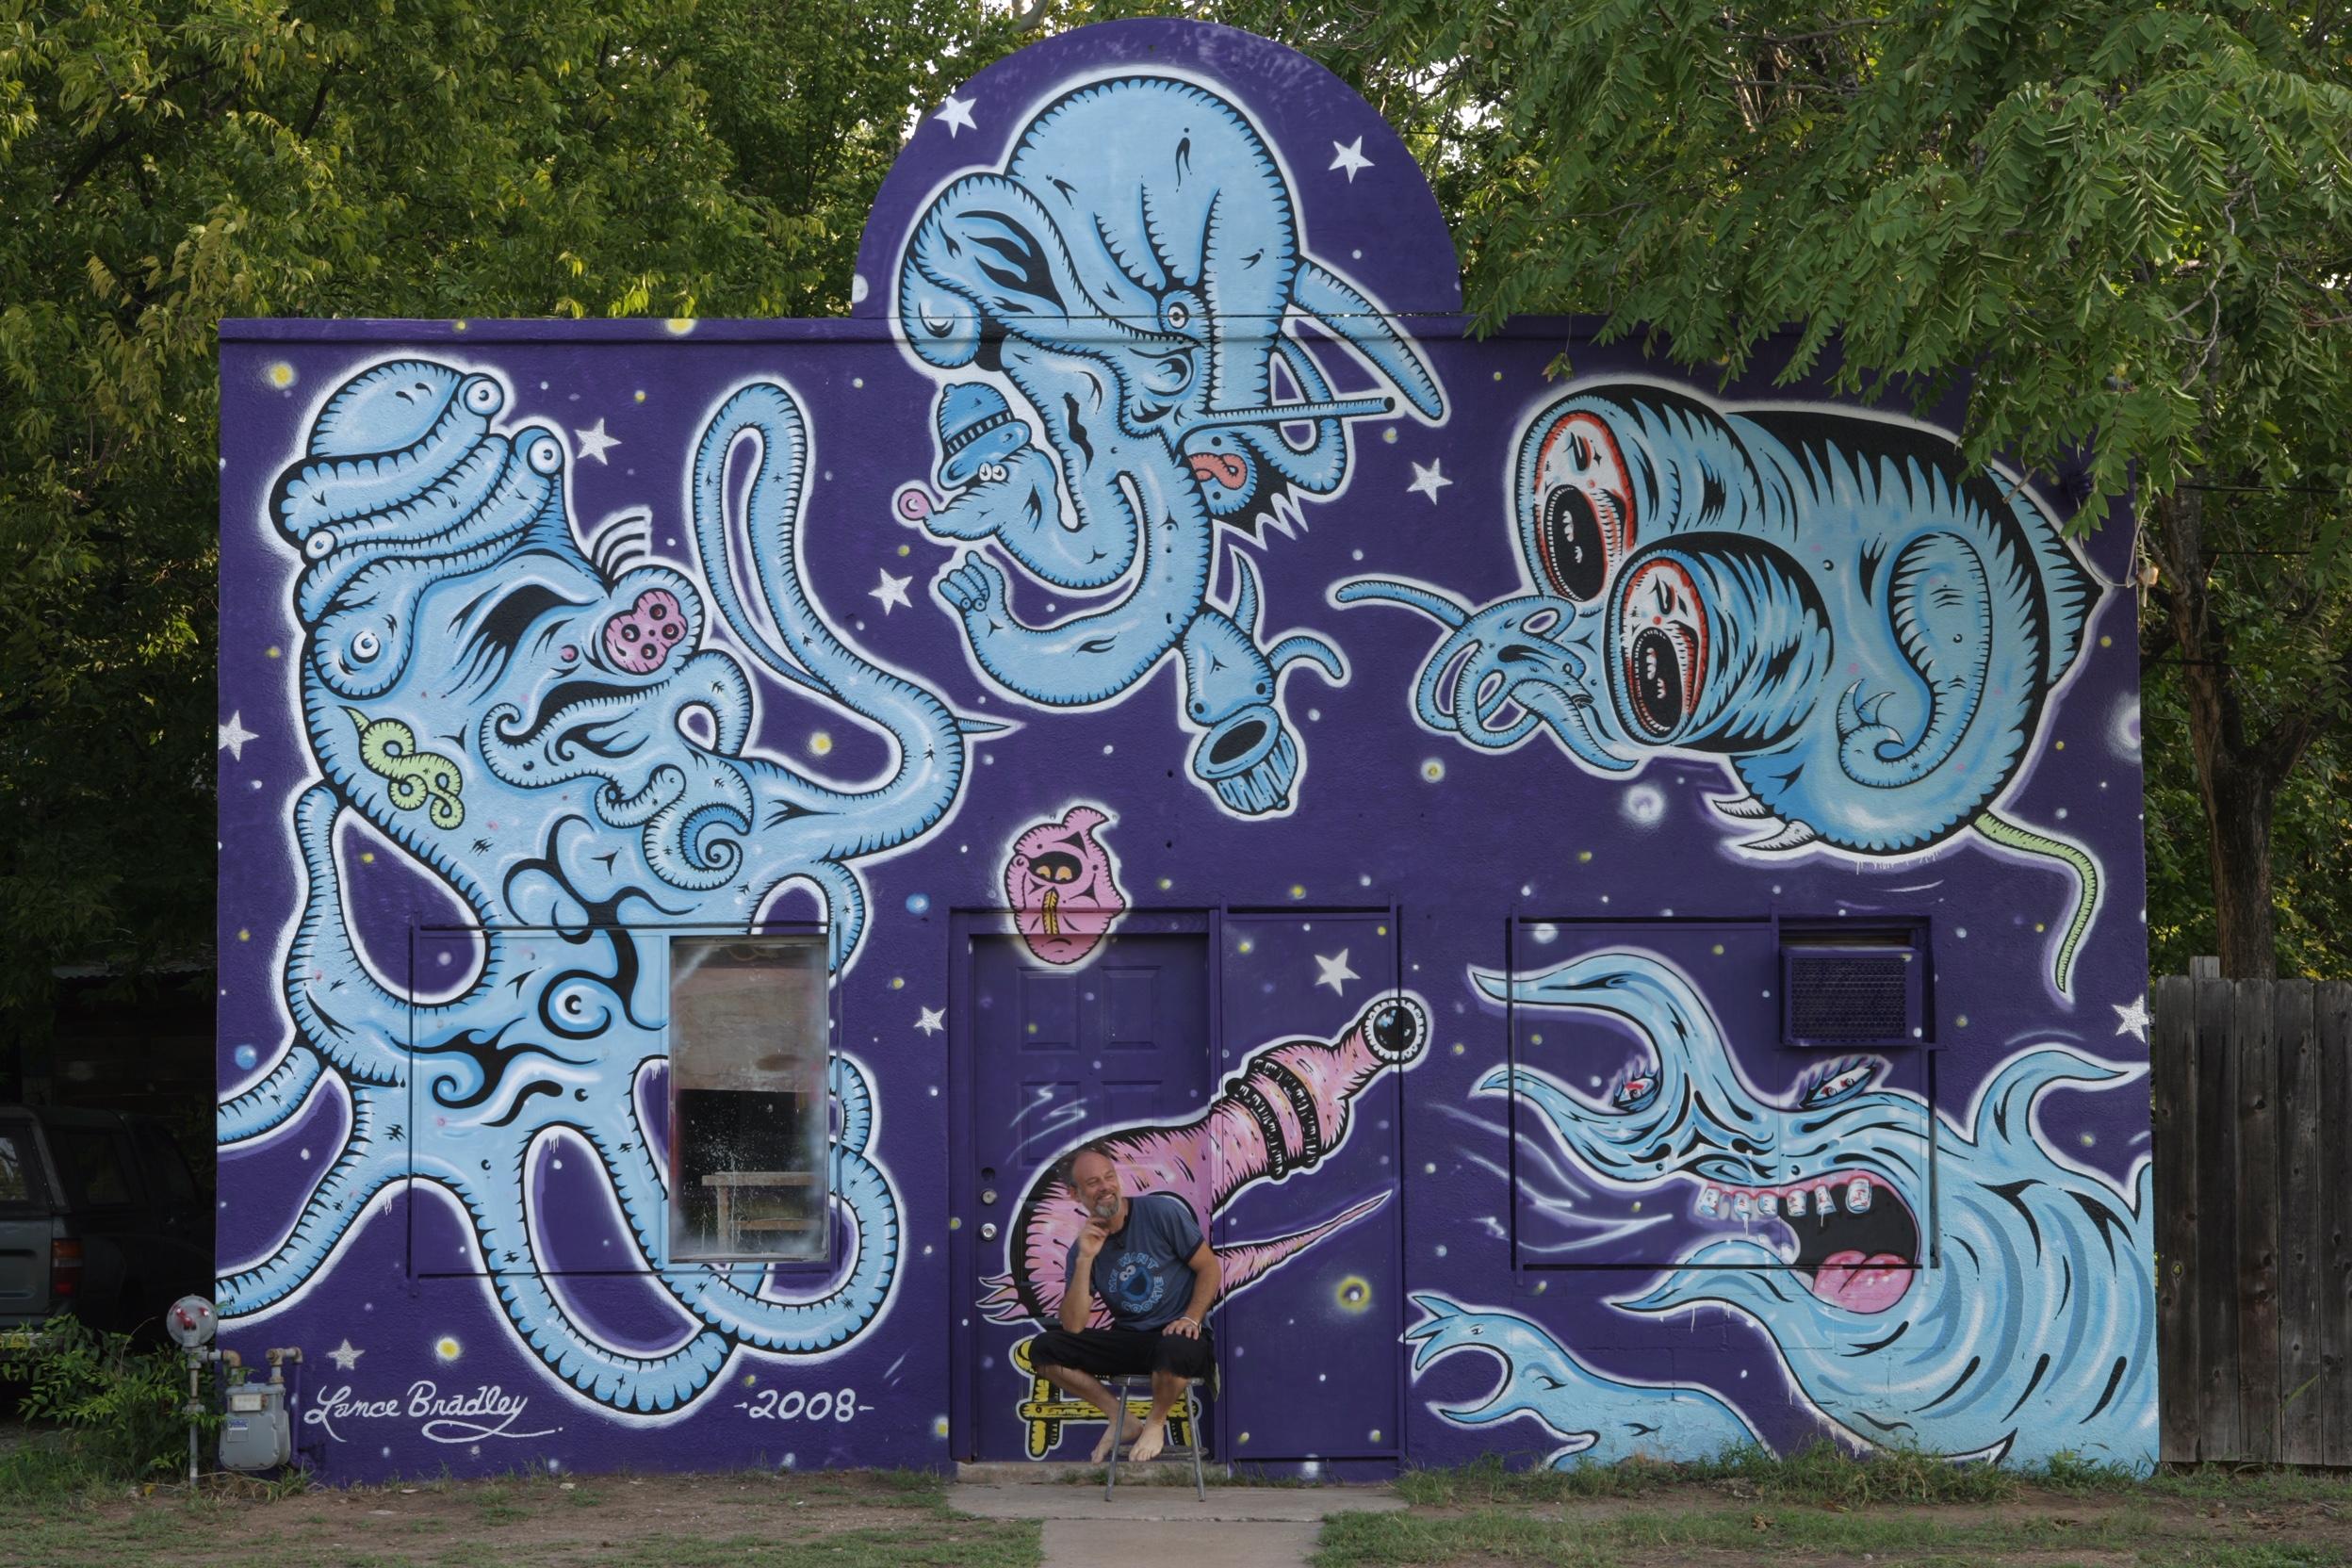 """Demon Shrimp Fest,""  Austin, TX -2008. Acrylic / oil on CMU and wood, 15 ft x 24 ft."